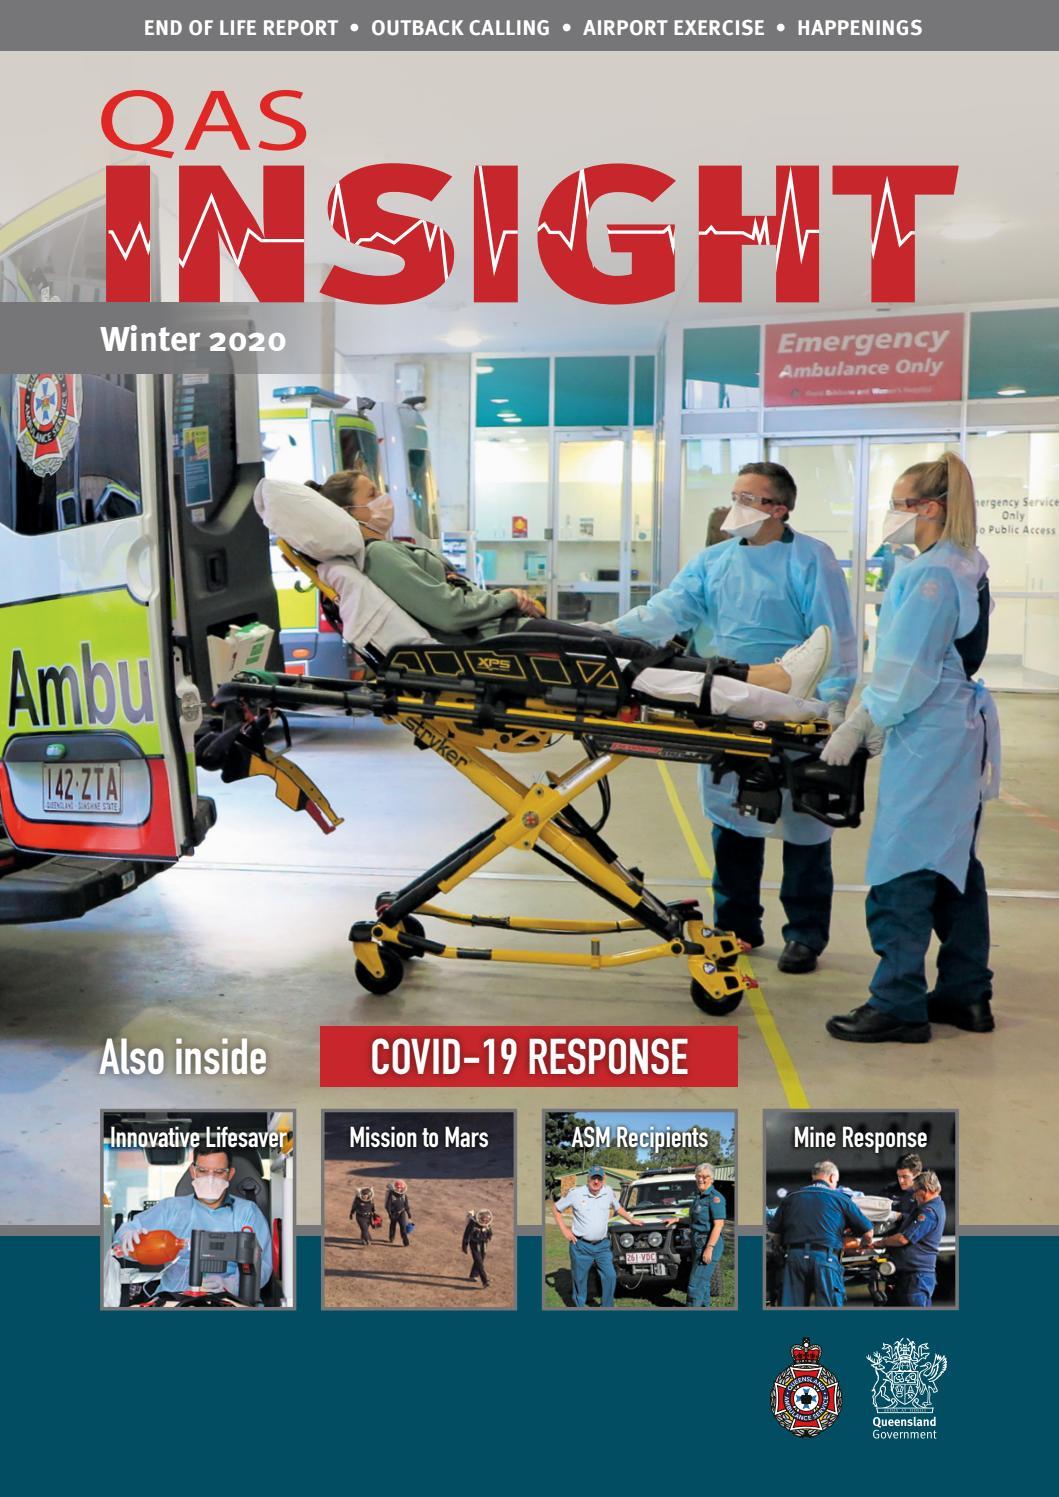 Qas Insight Magazine Winter 2020 Edition By Qas Media Issuu